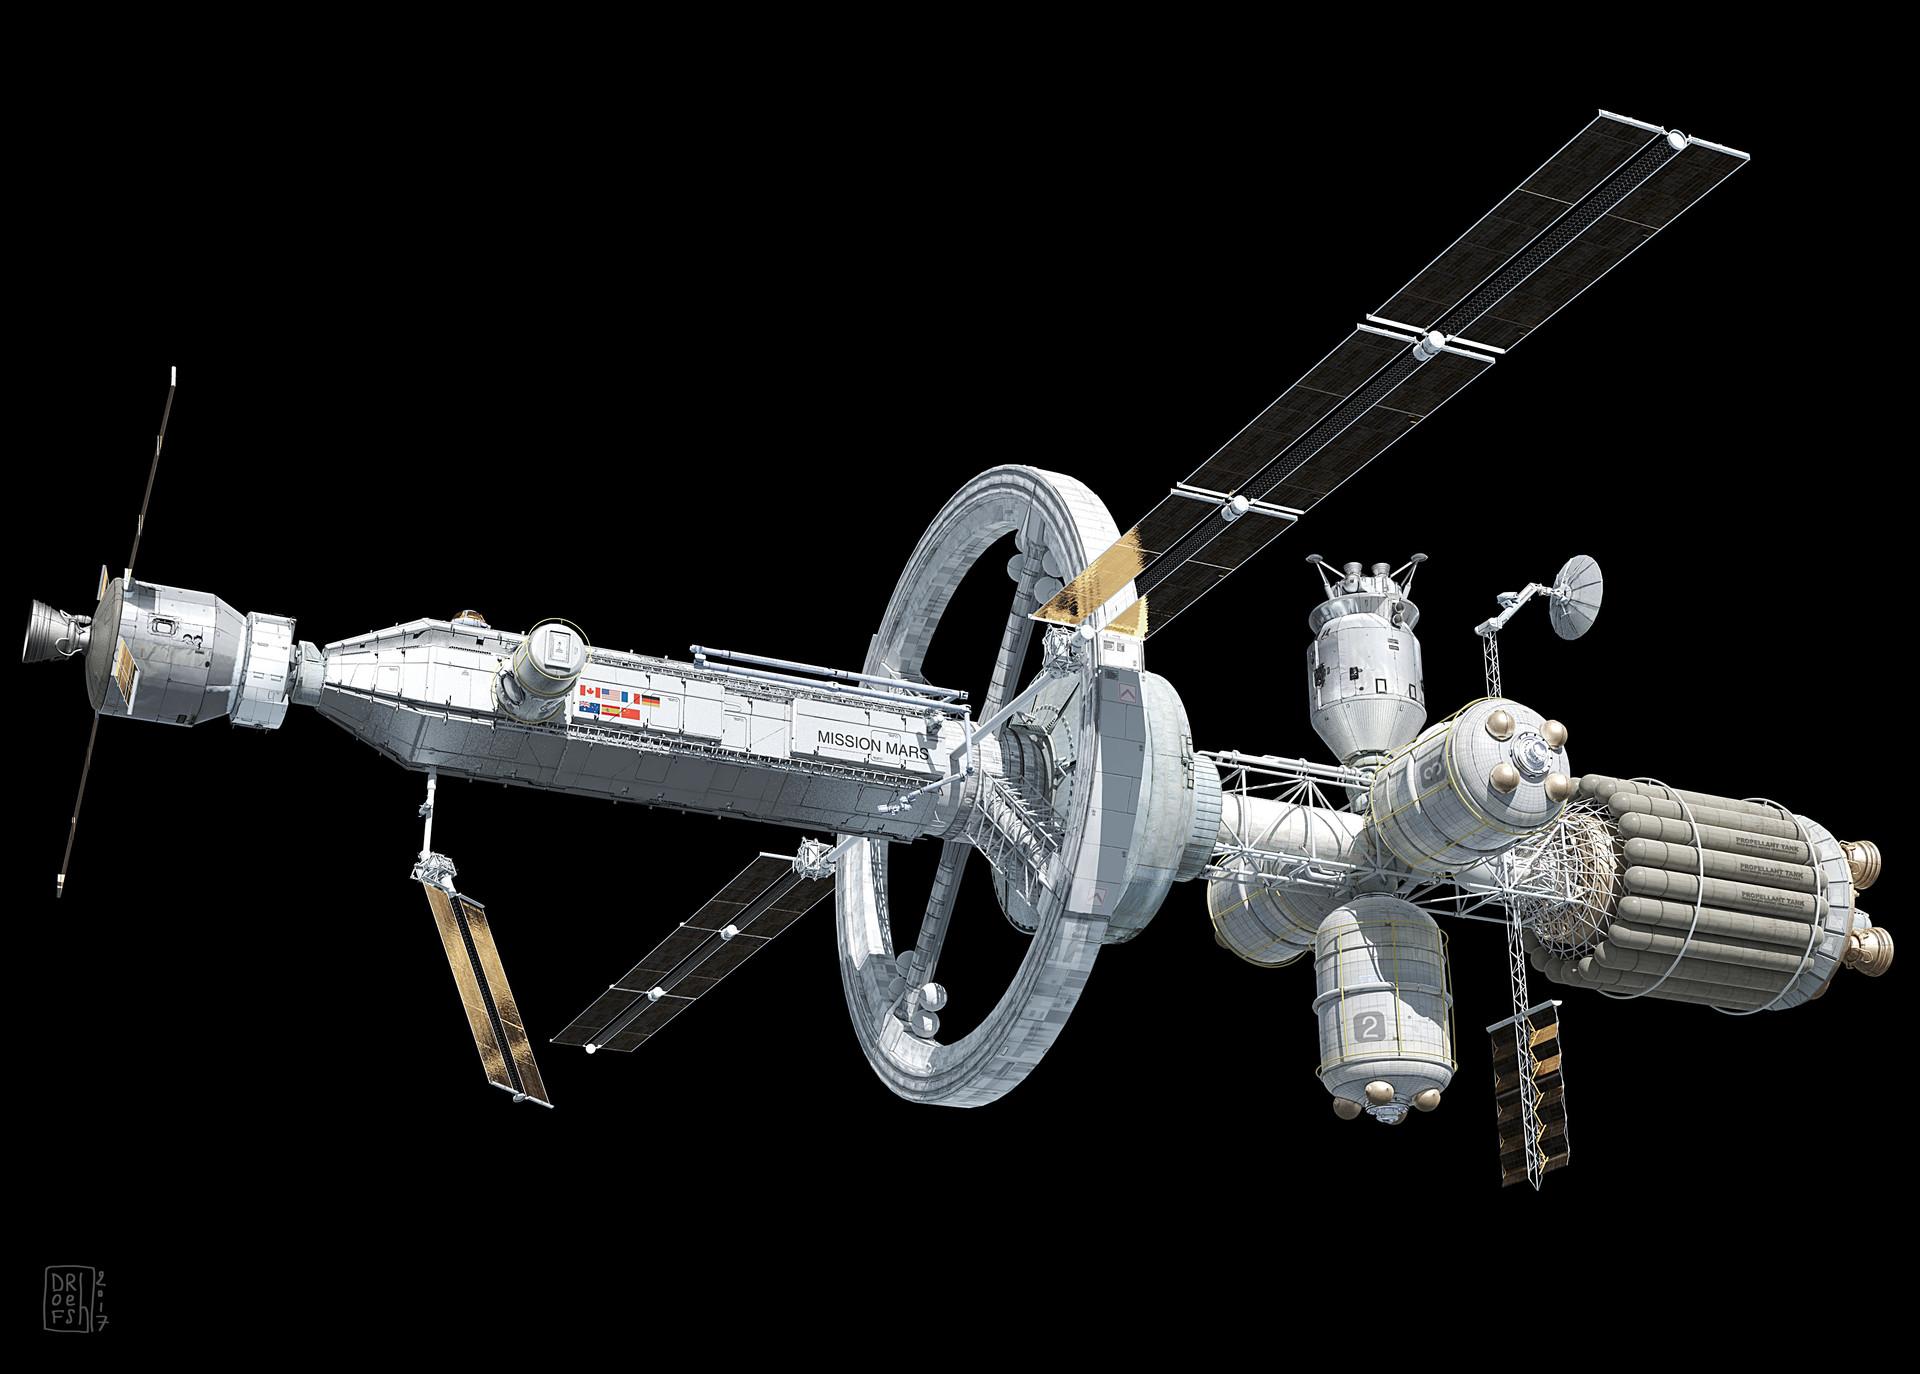 Dofresh missionmars spaceship